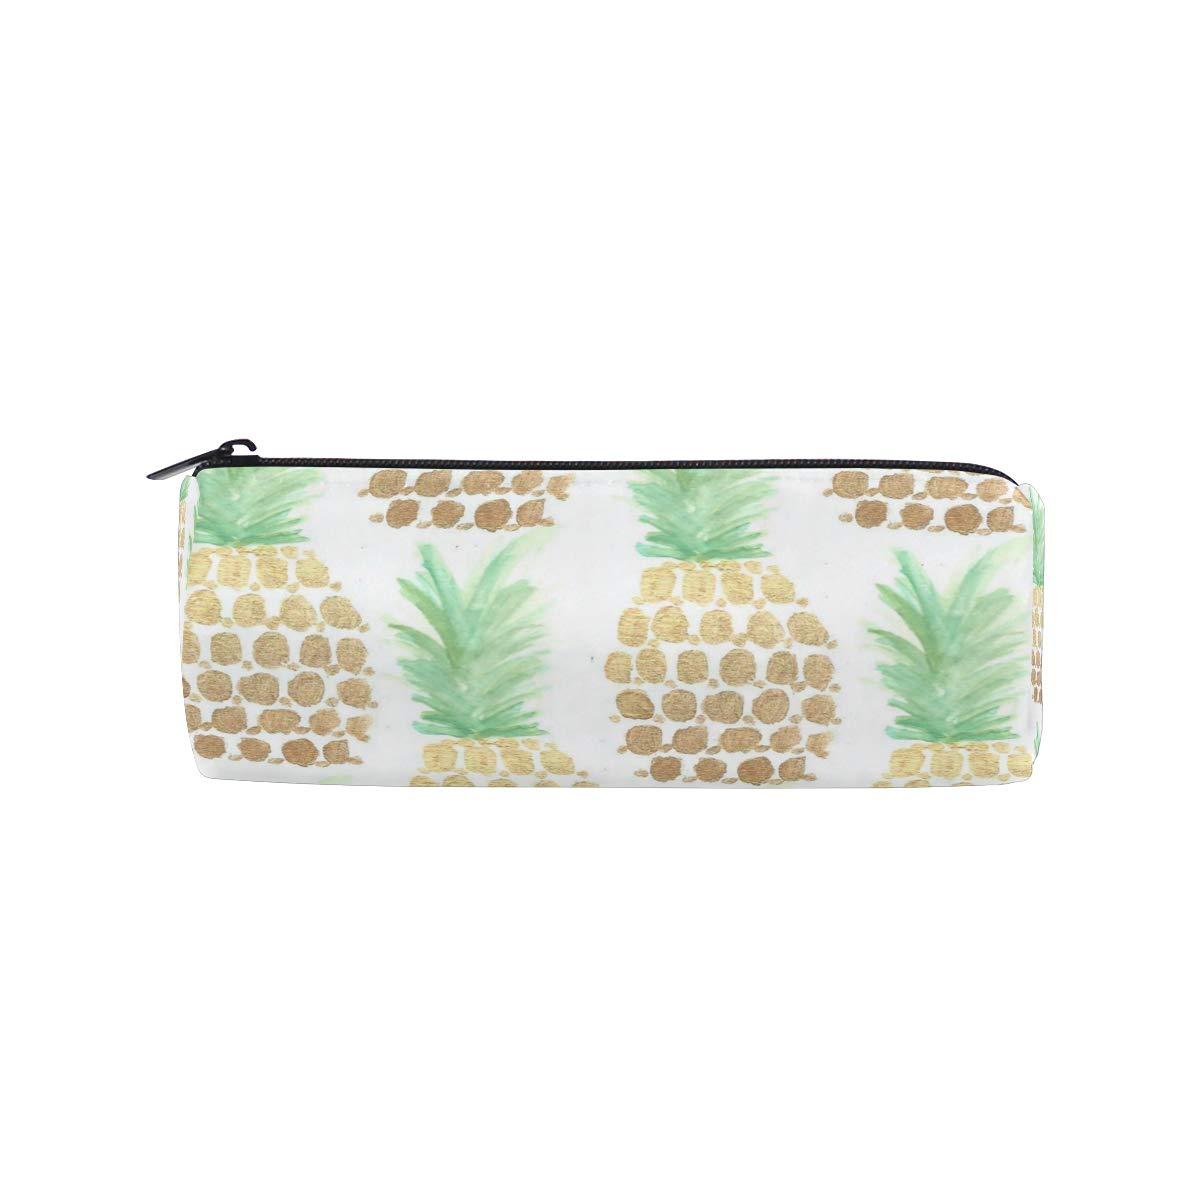 Pencil Case Trend Art Pineapples School Pen Pouch Office Zippered Pencil Cases Holder Women Makeup Bag